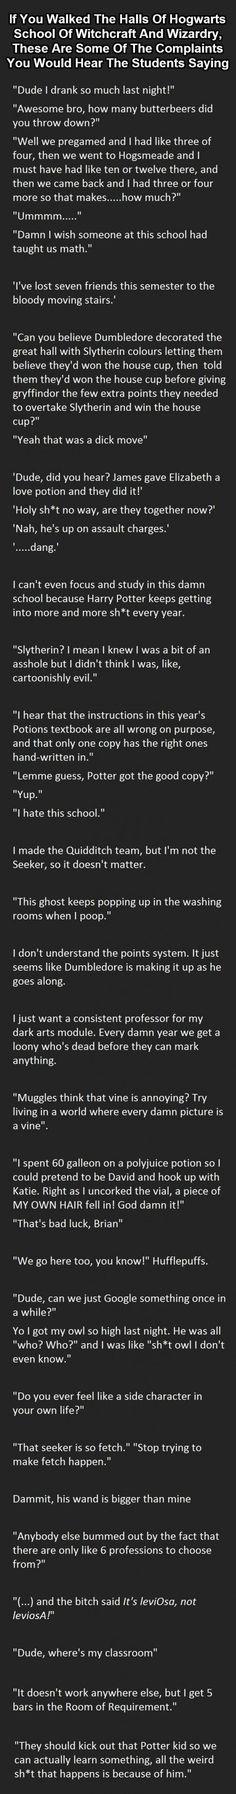 Harry potter probs